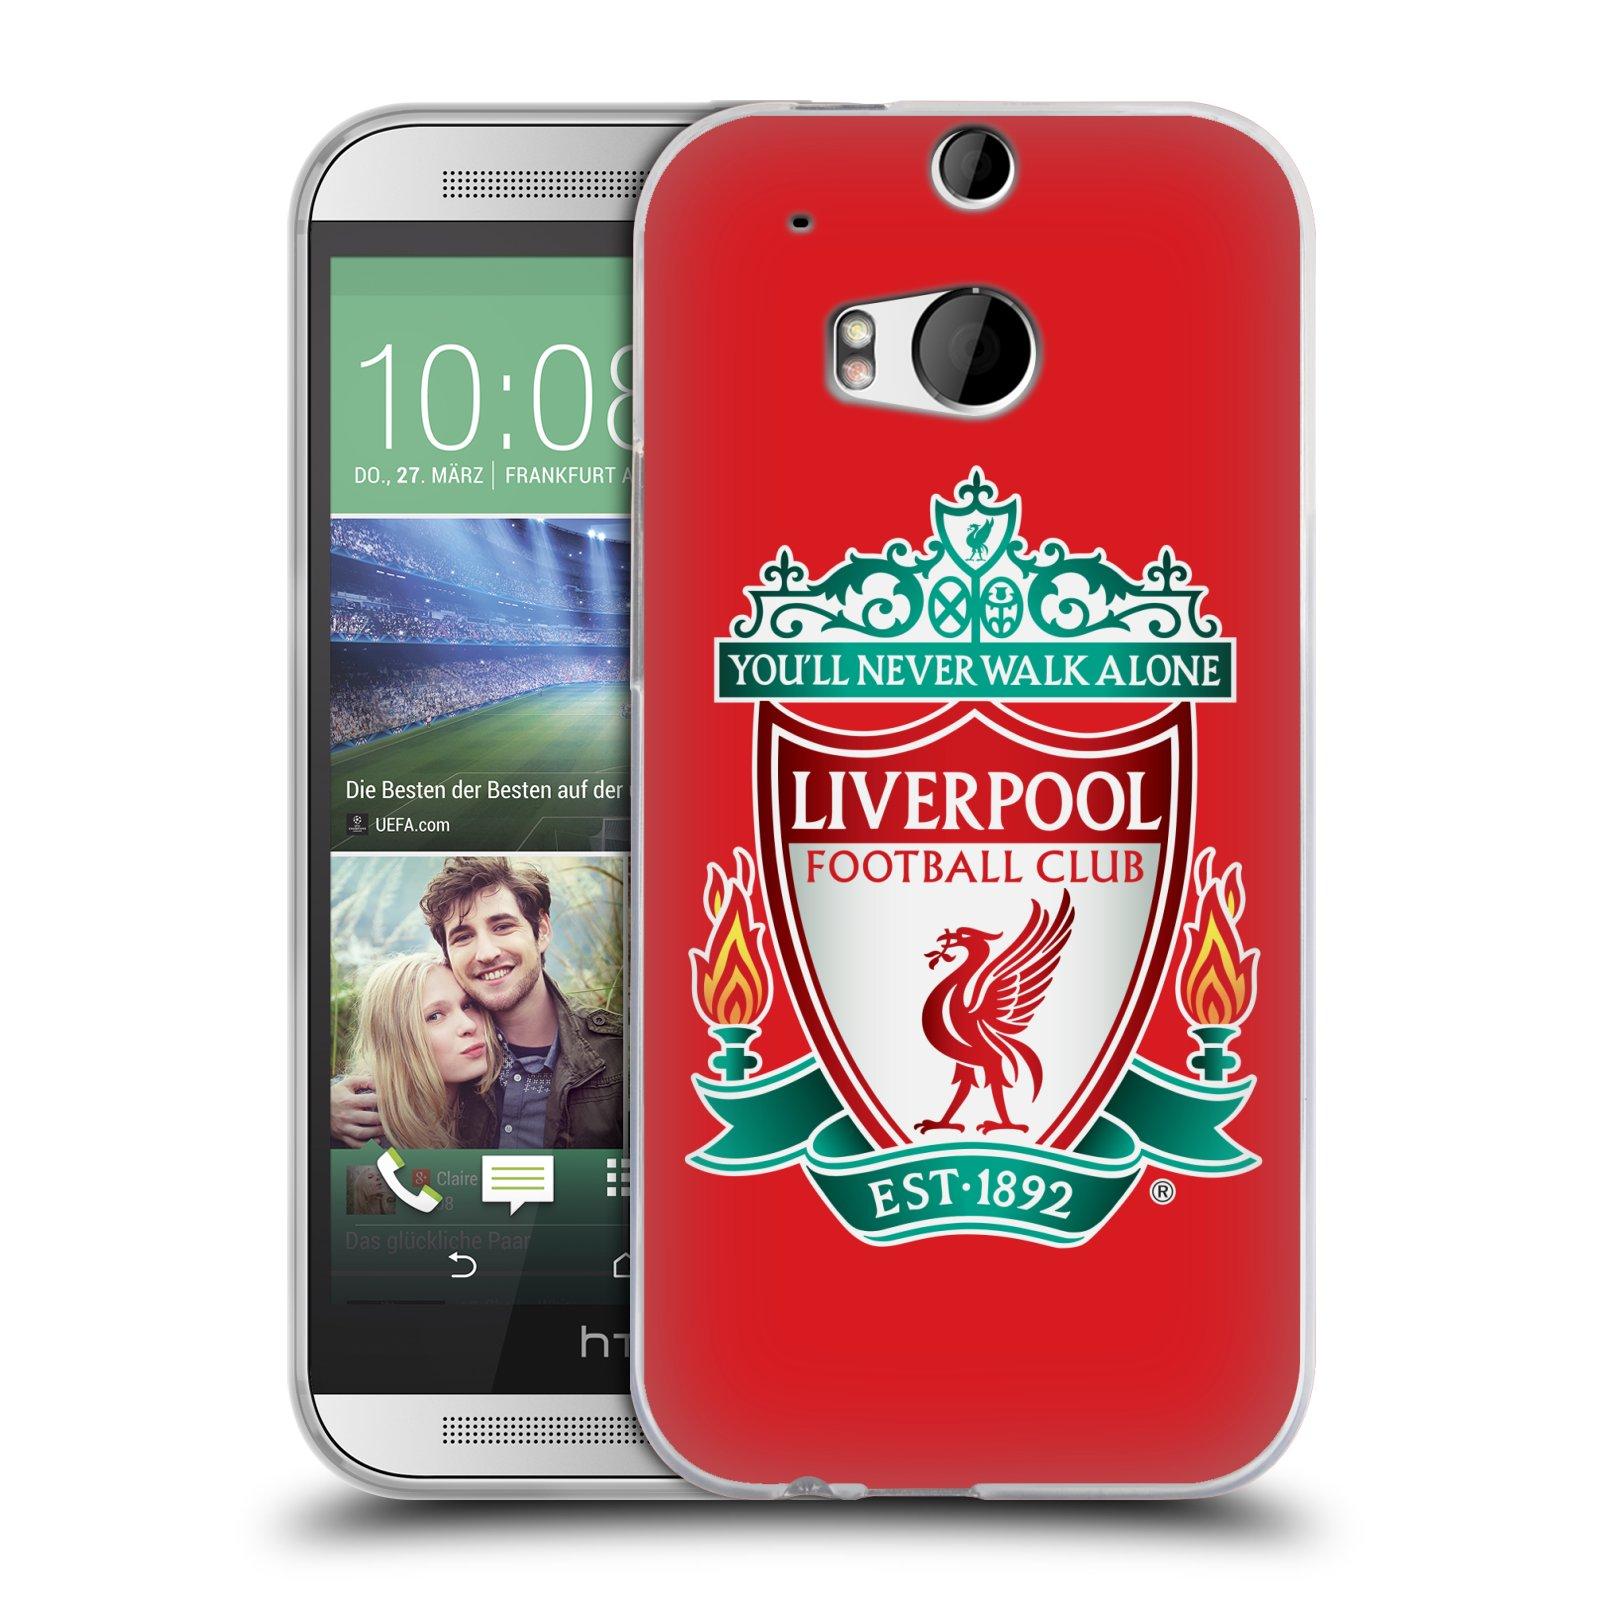 Silikonové pouzdro na mobil HTC ONE M8 HEAD CASE ZNAK LIVERPOOL FC OFFICIAL RED (Silikonový kryt či obal na mobilní telefon Liverpool FC Official pro HTC ONE M8)